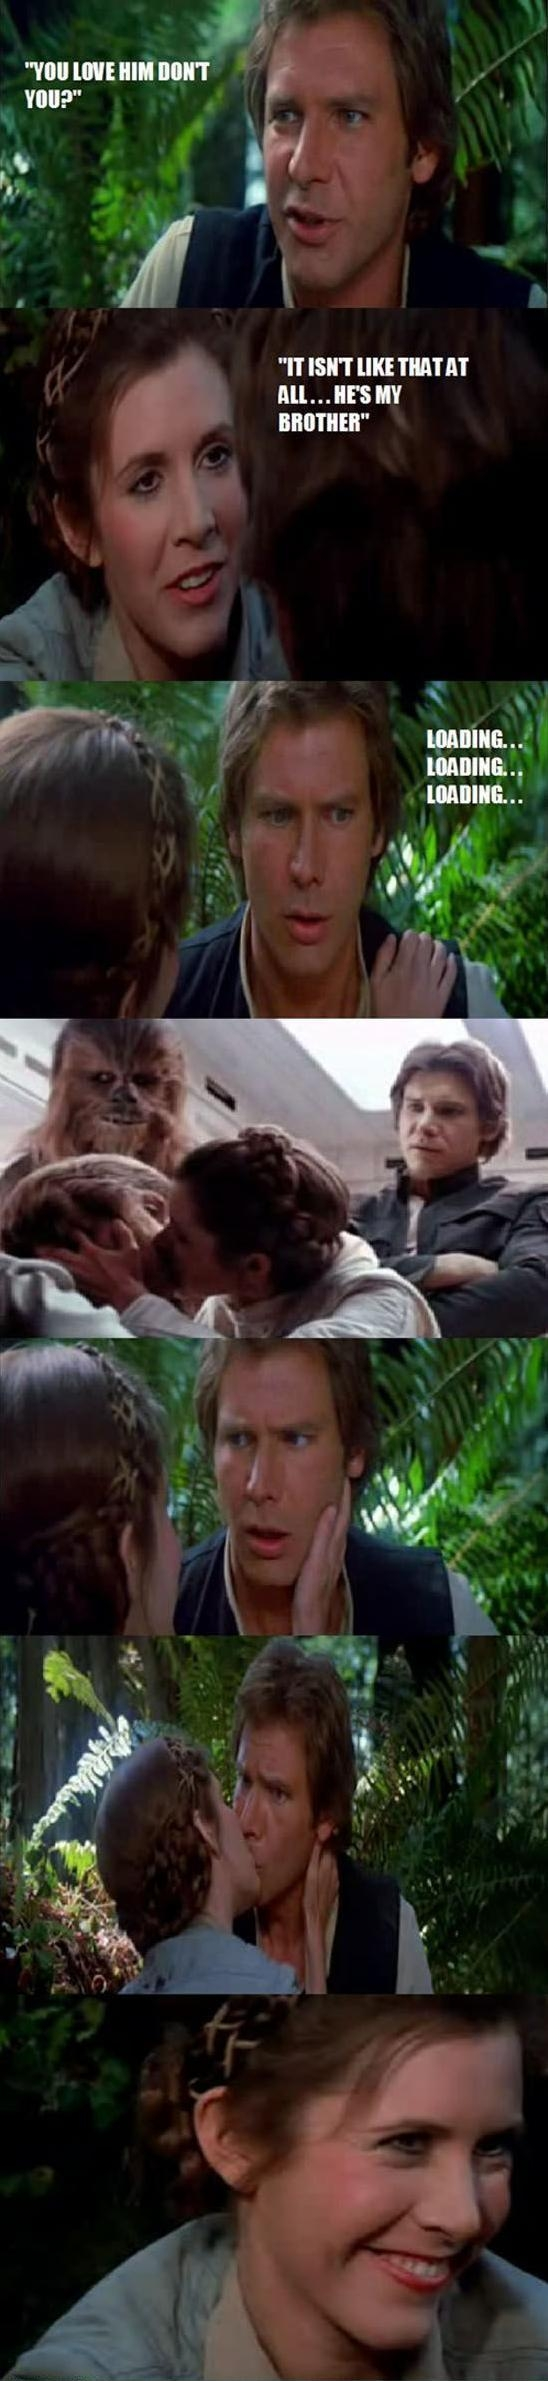 Scumbag Leia Star Wars Memes Funny Star Wars Memes Star Wars Humor